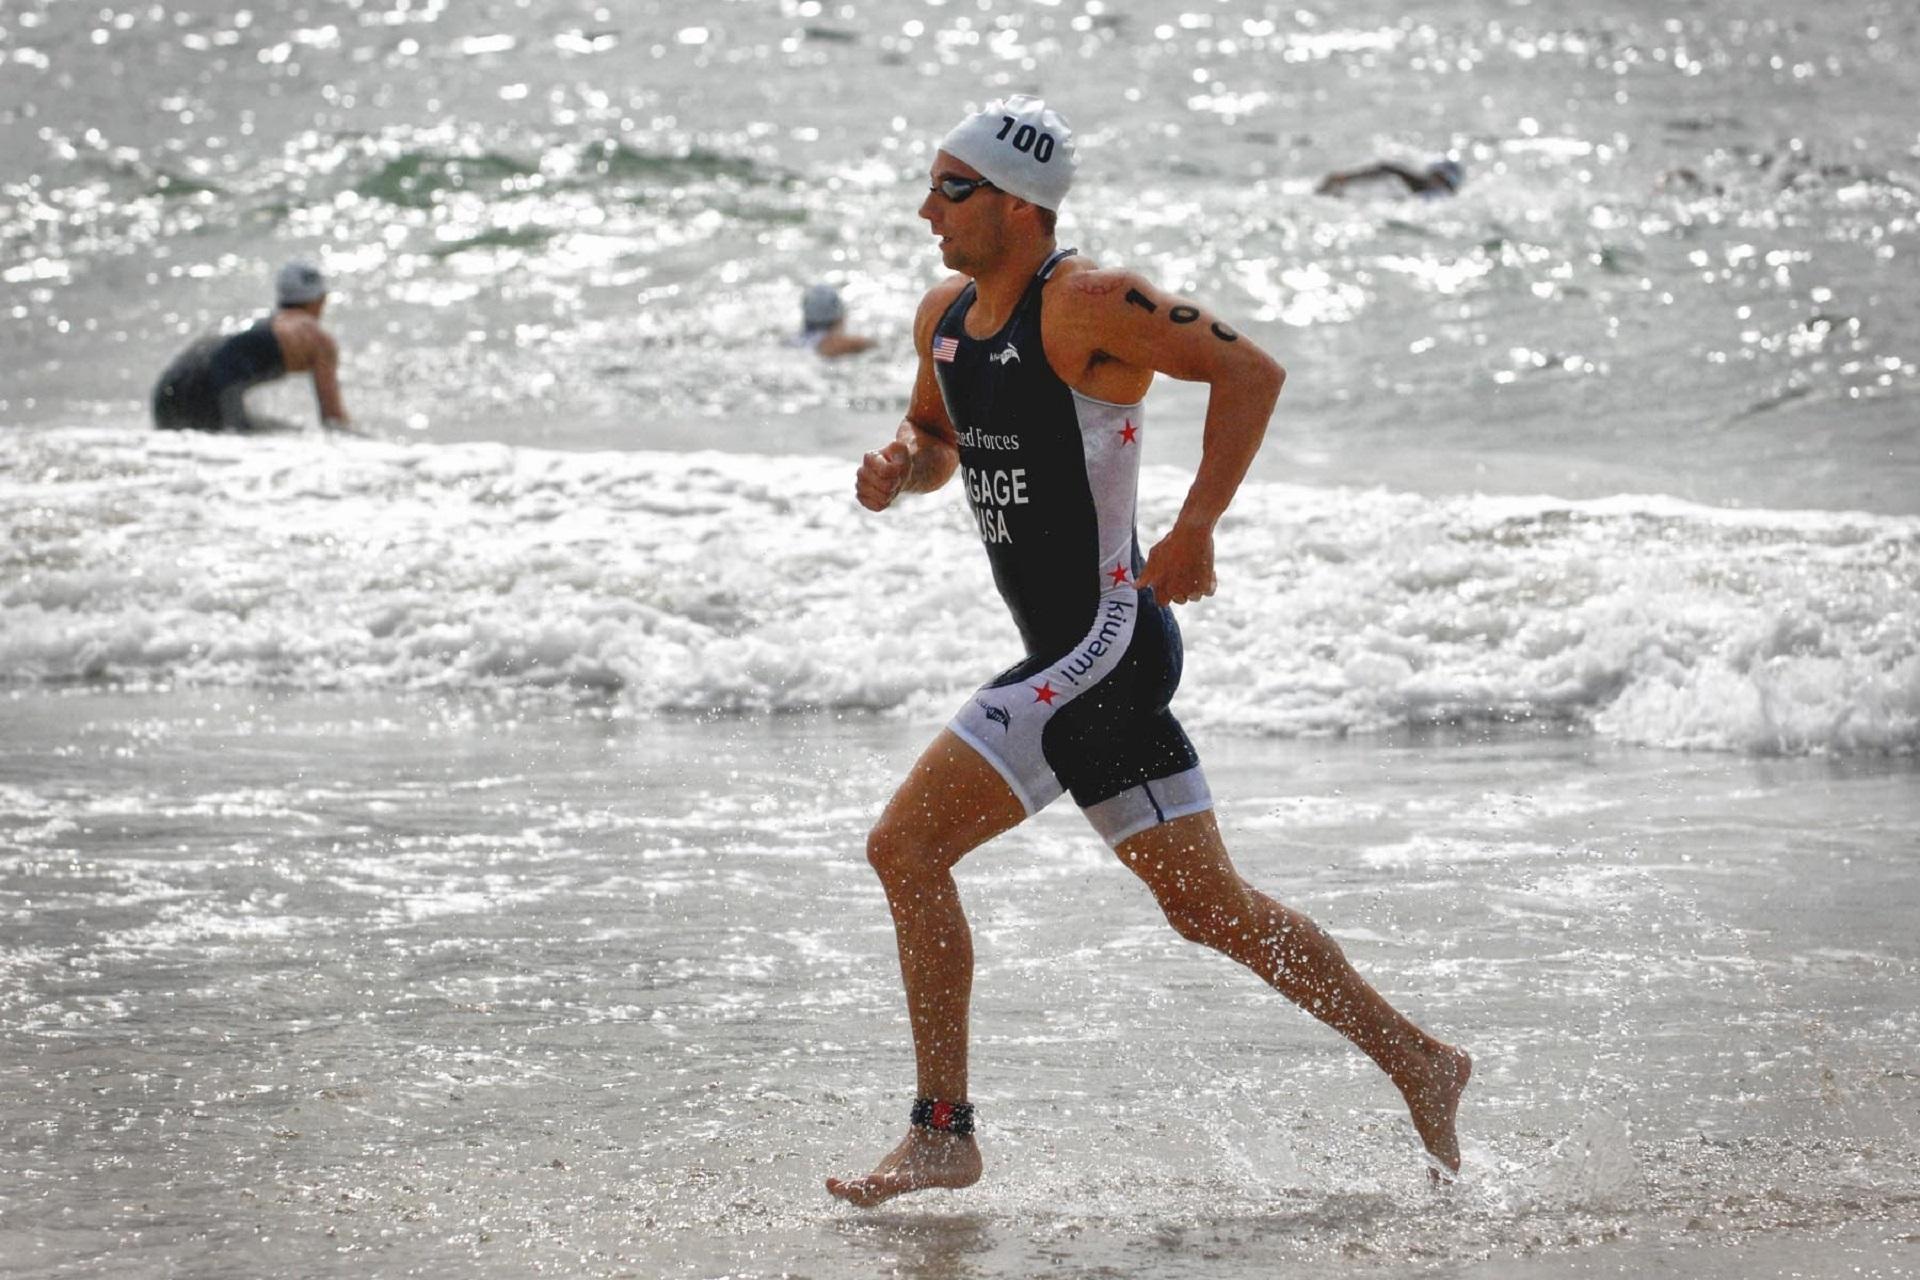 Running on the Beach, Activity, Athlete, Beach, Fit, HQ Photo